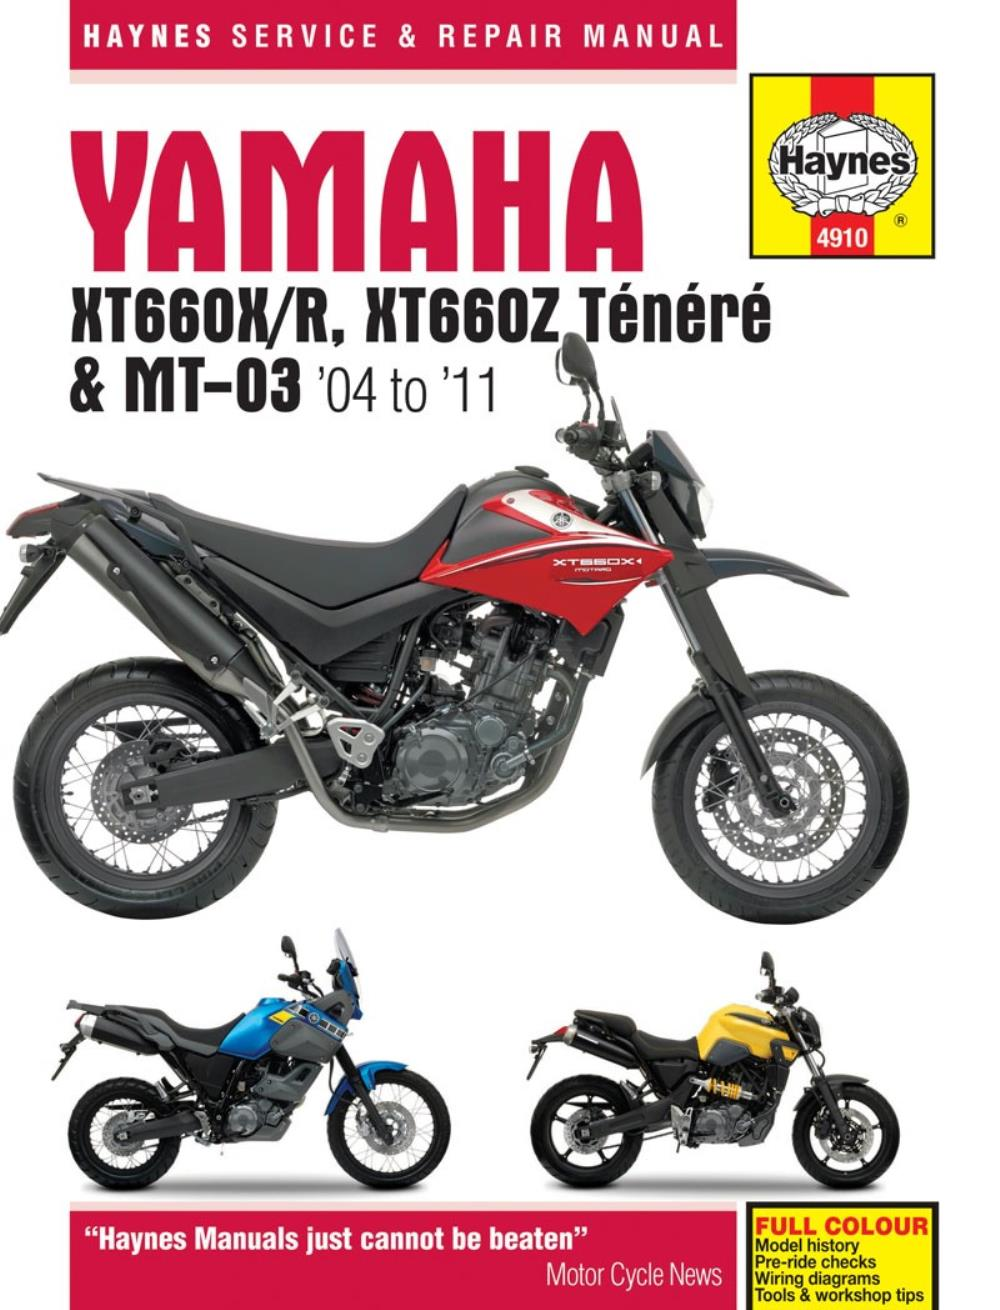 Manual Haynes For 2006 Yamaha Xt 660 X Supermoto 1d26 Ebay Rhino Wiring Diagram Description